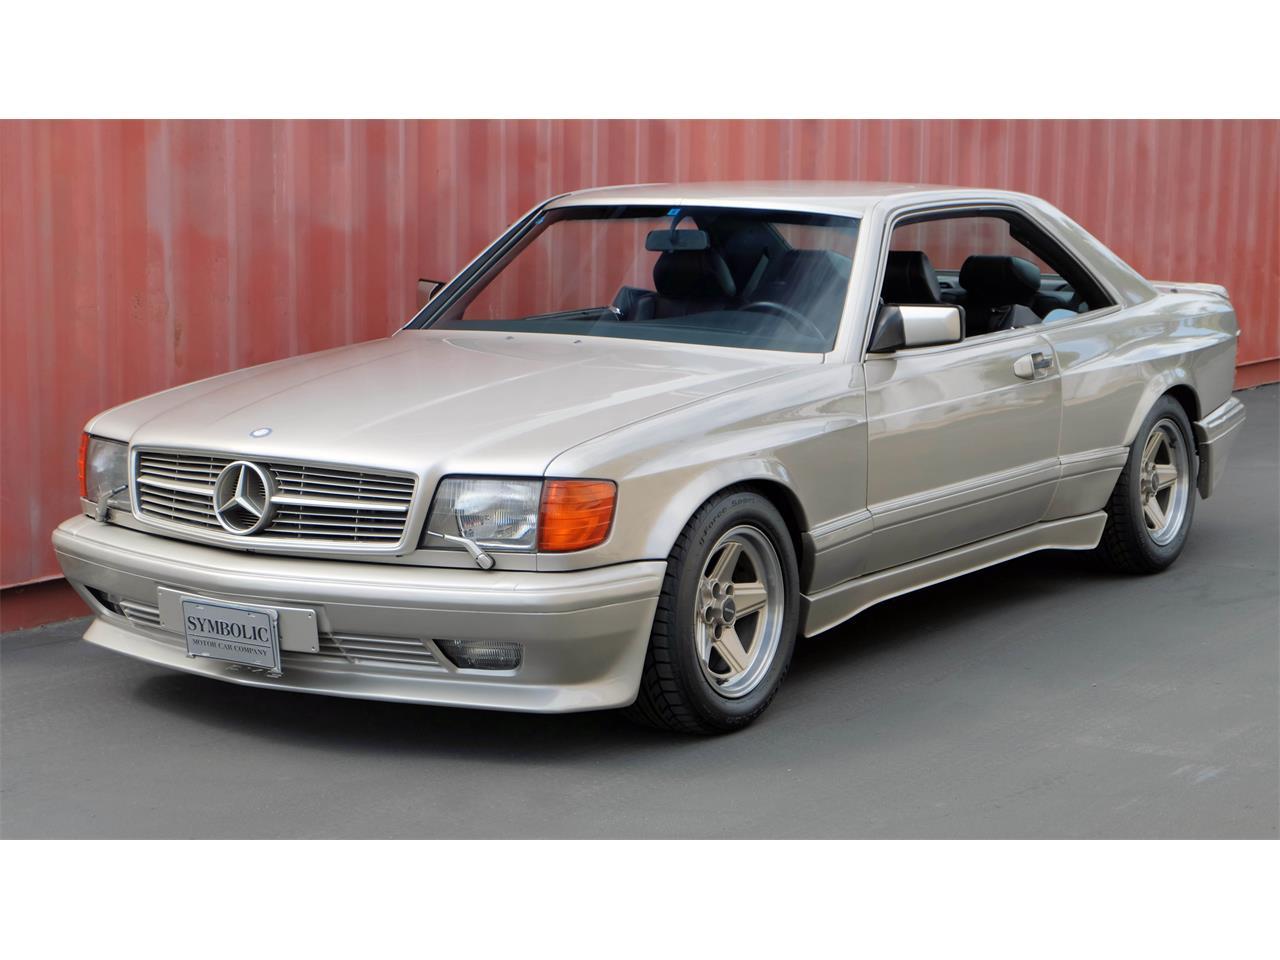 1989 Mercedes-Benz 560SEC AMG for Sale | ClassicCars com